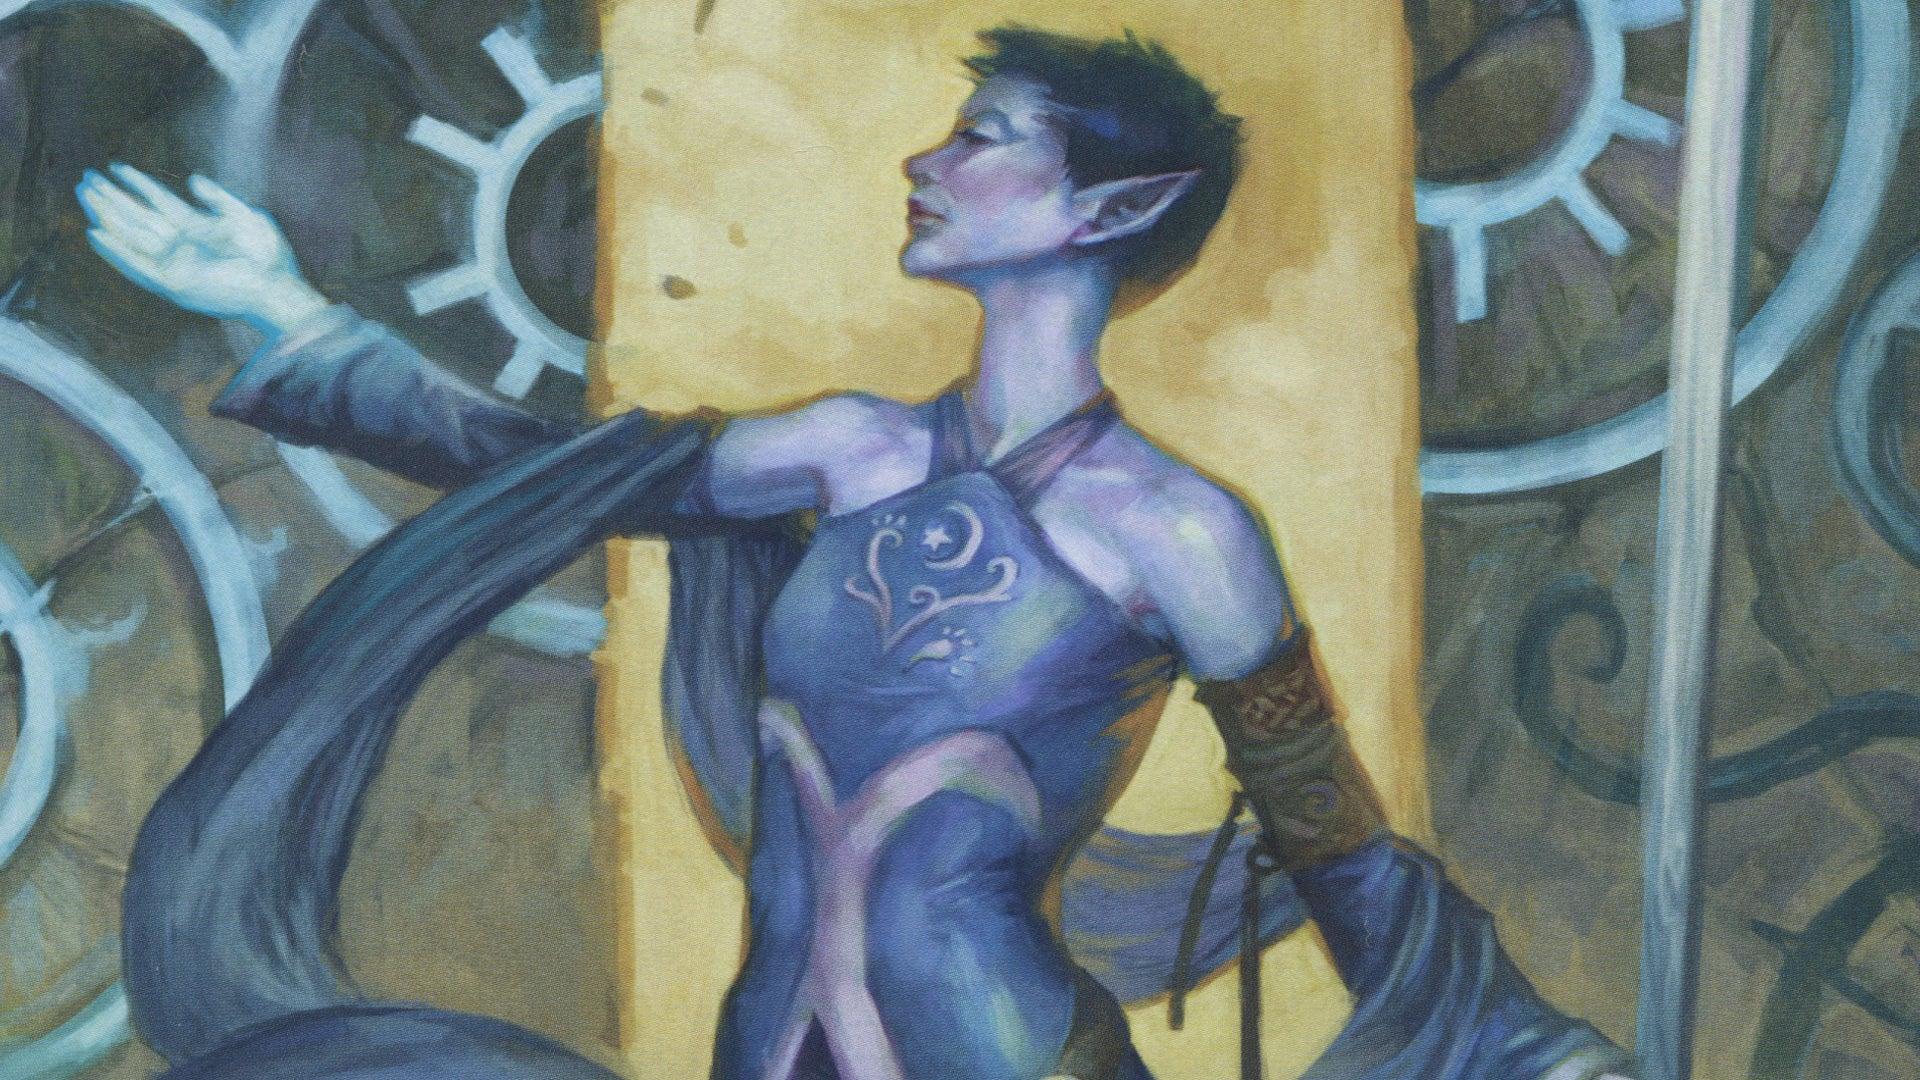 Dungeons & Dragons 5e Players Handbook artwork 3